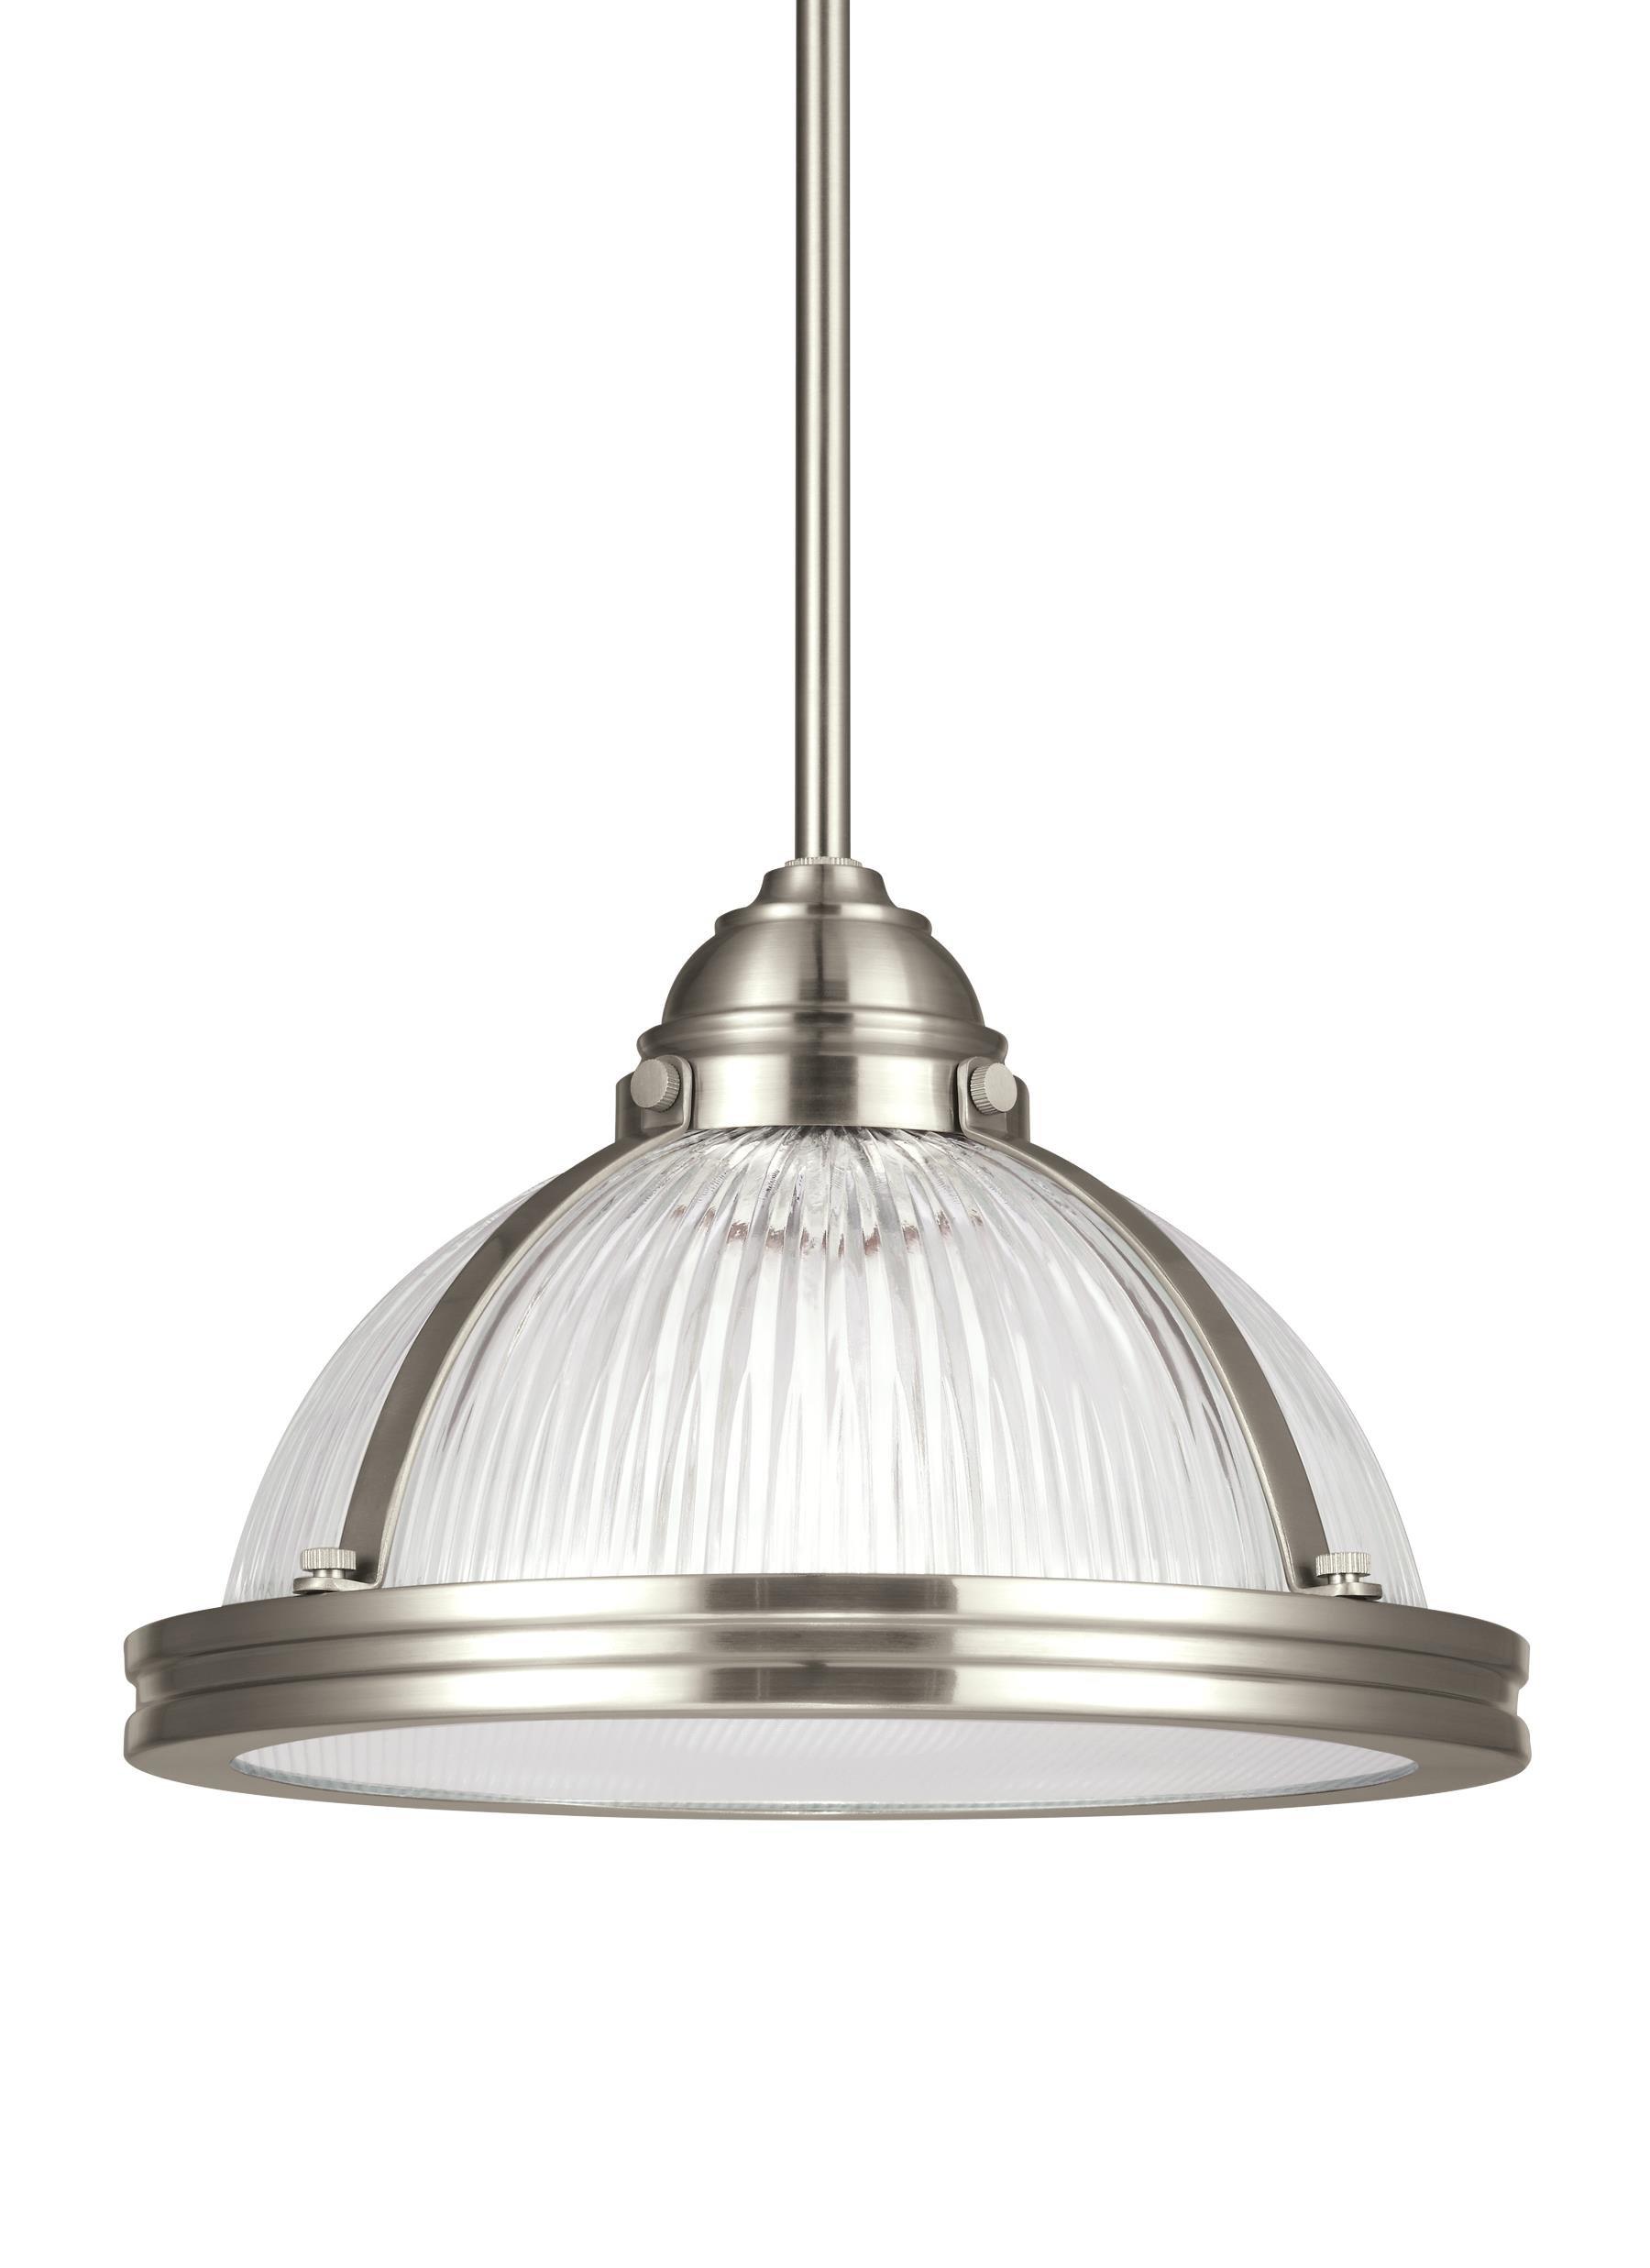 1-Light Bowl Pendant with regard to Granville 2-Light Single Dome Pendants (Image 1 of 30)